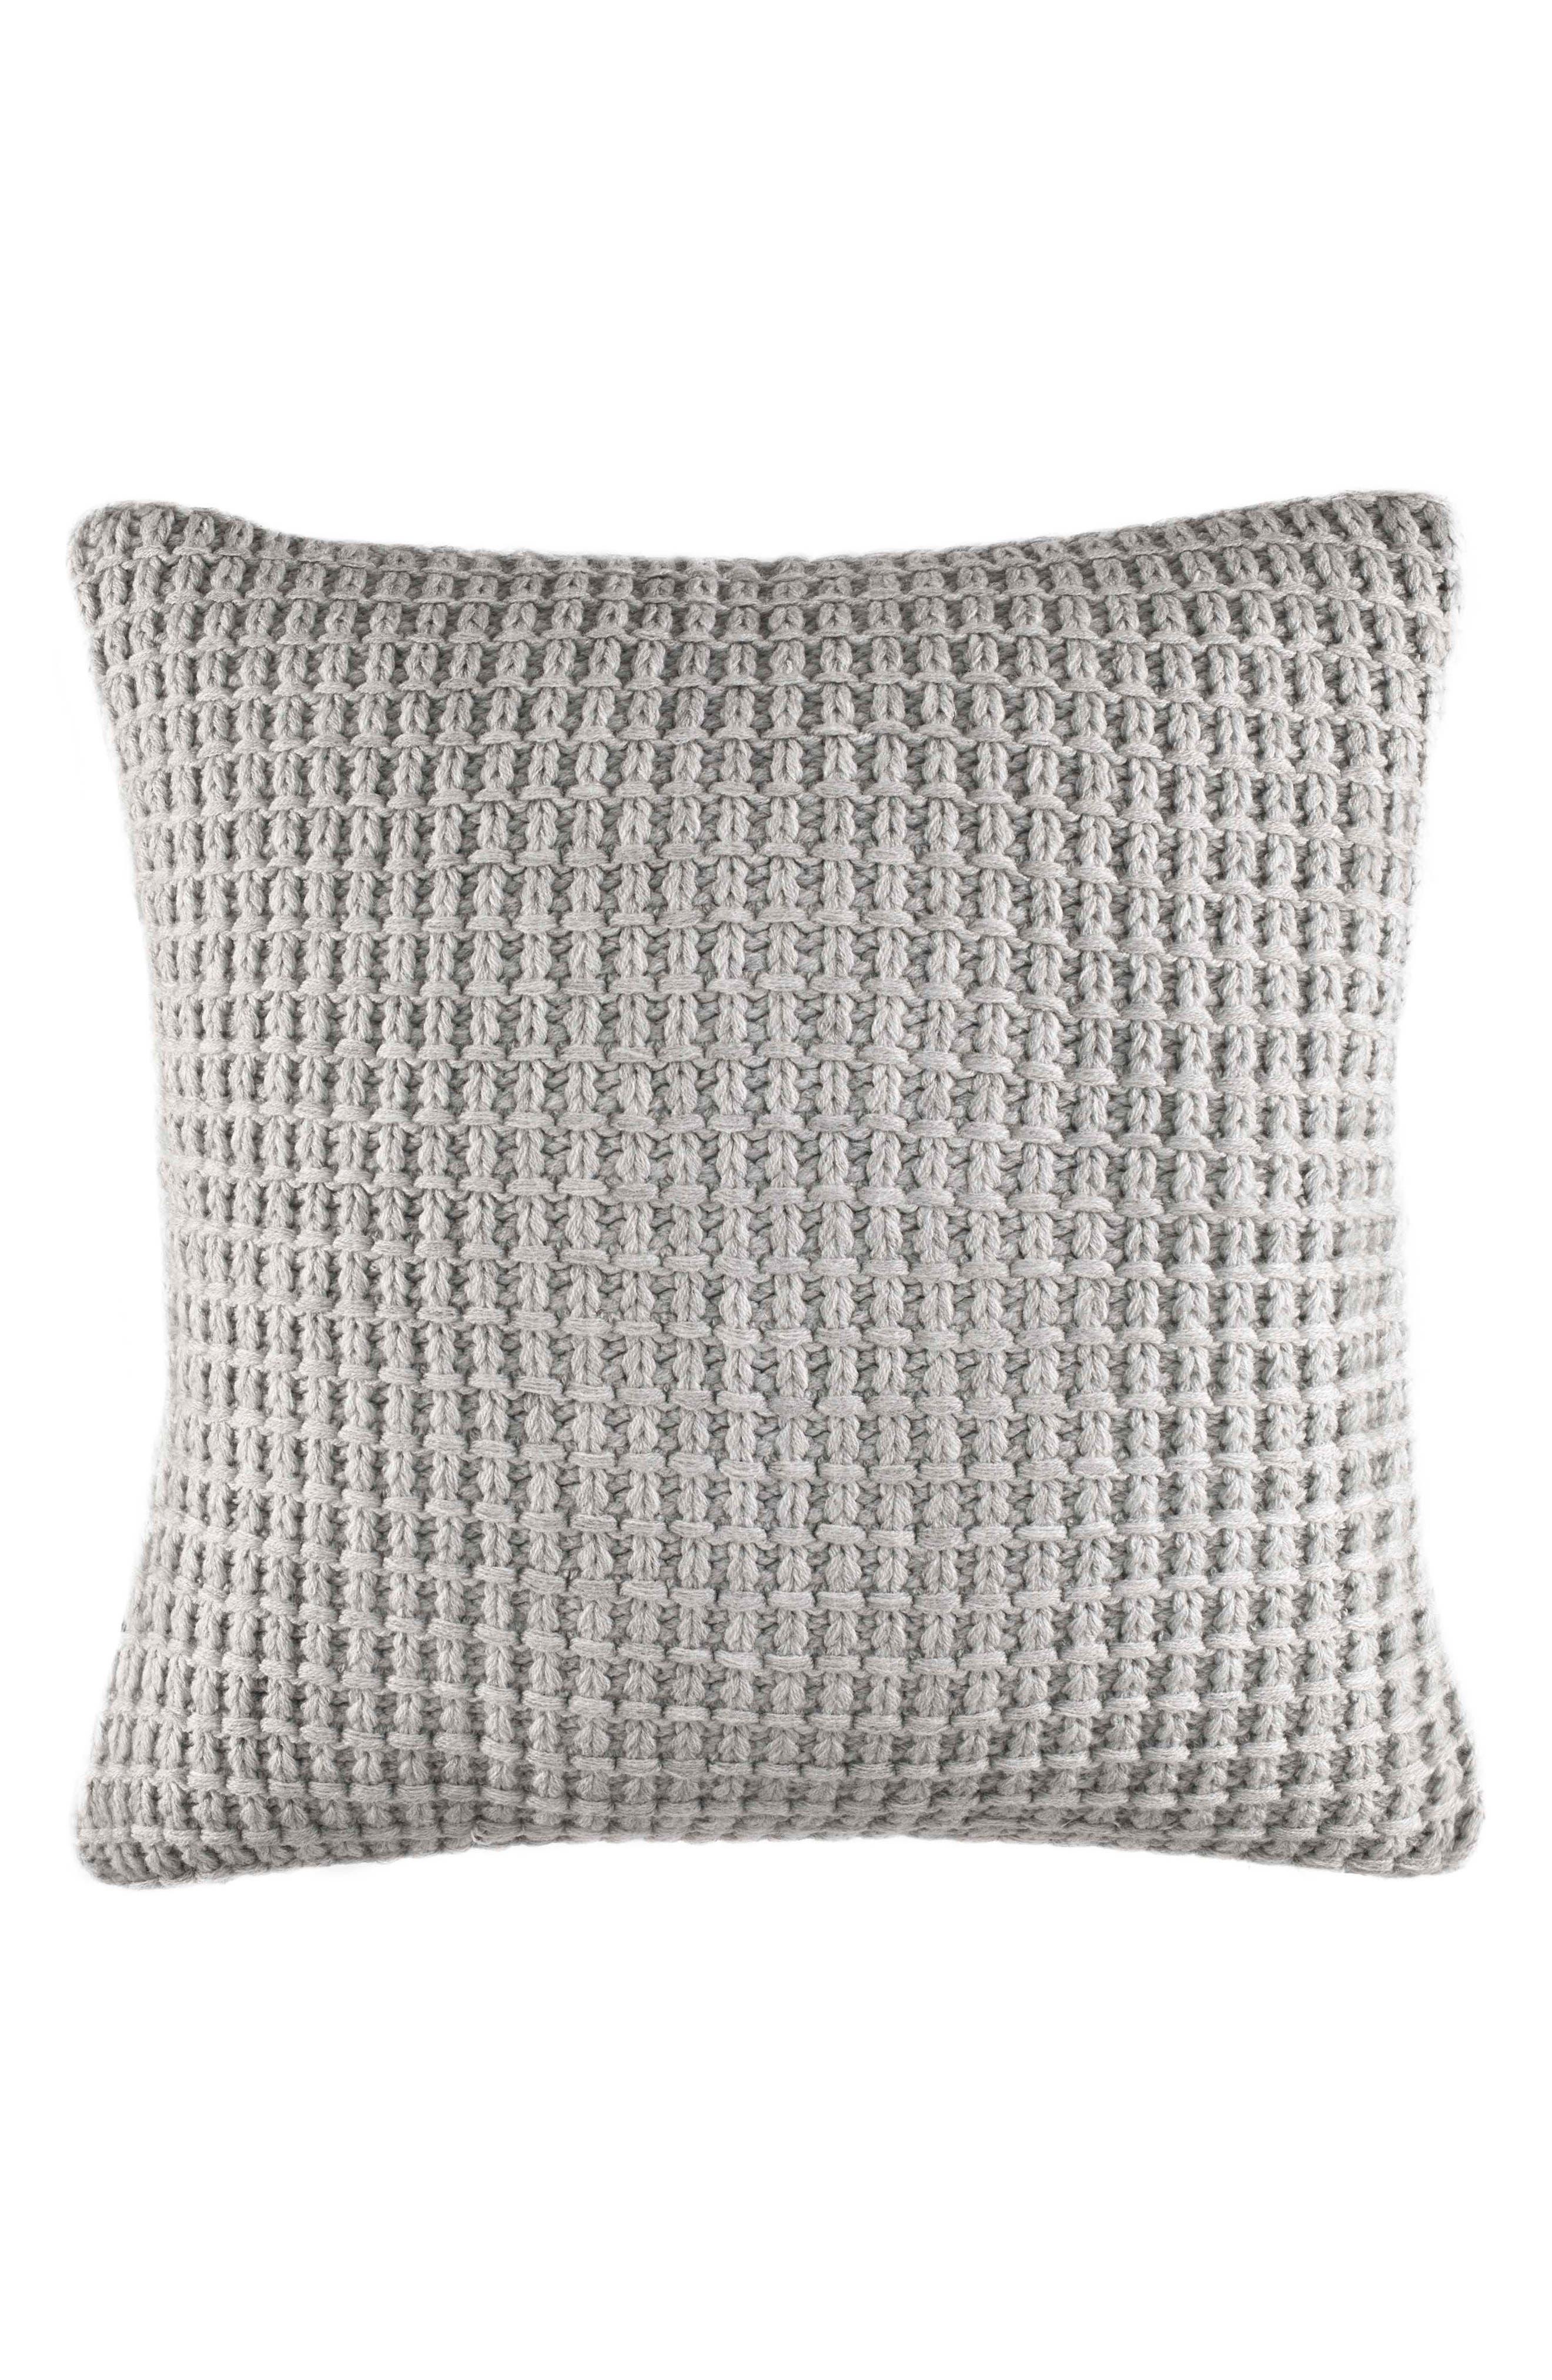 NAUTICA, Grey Sweater Knit Pillow, Main thumbnail 1, color, 020